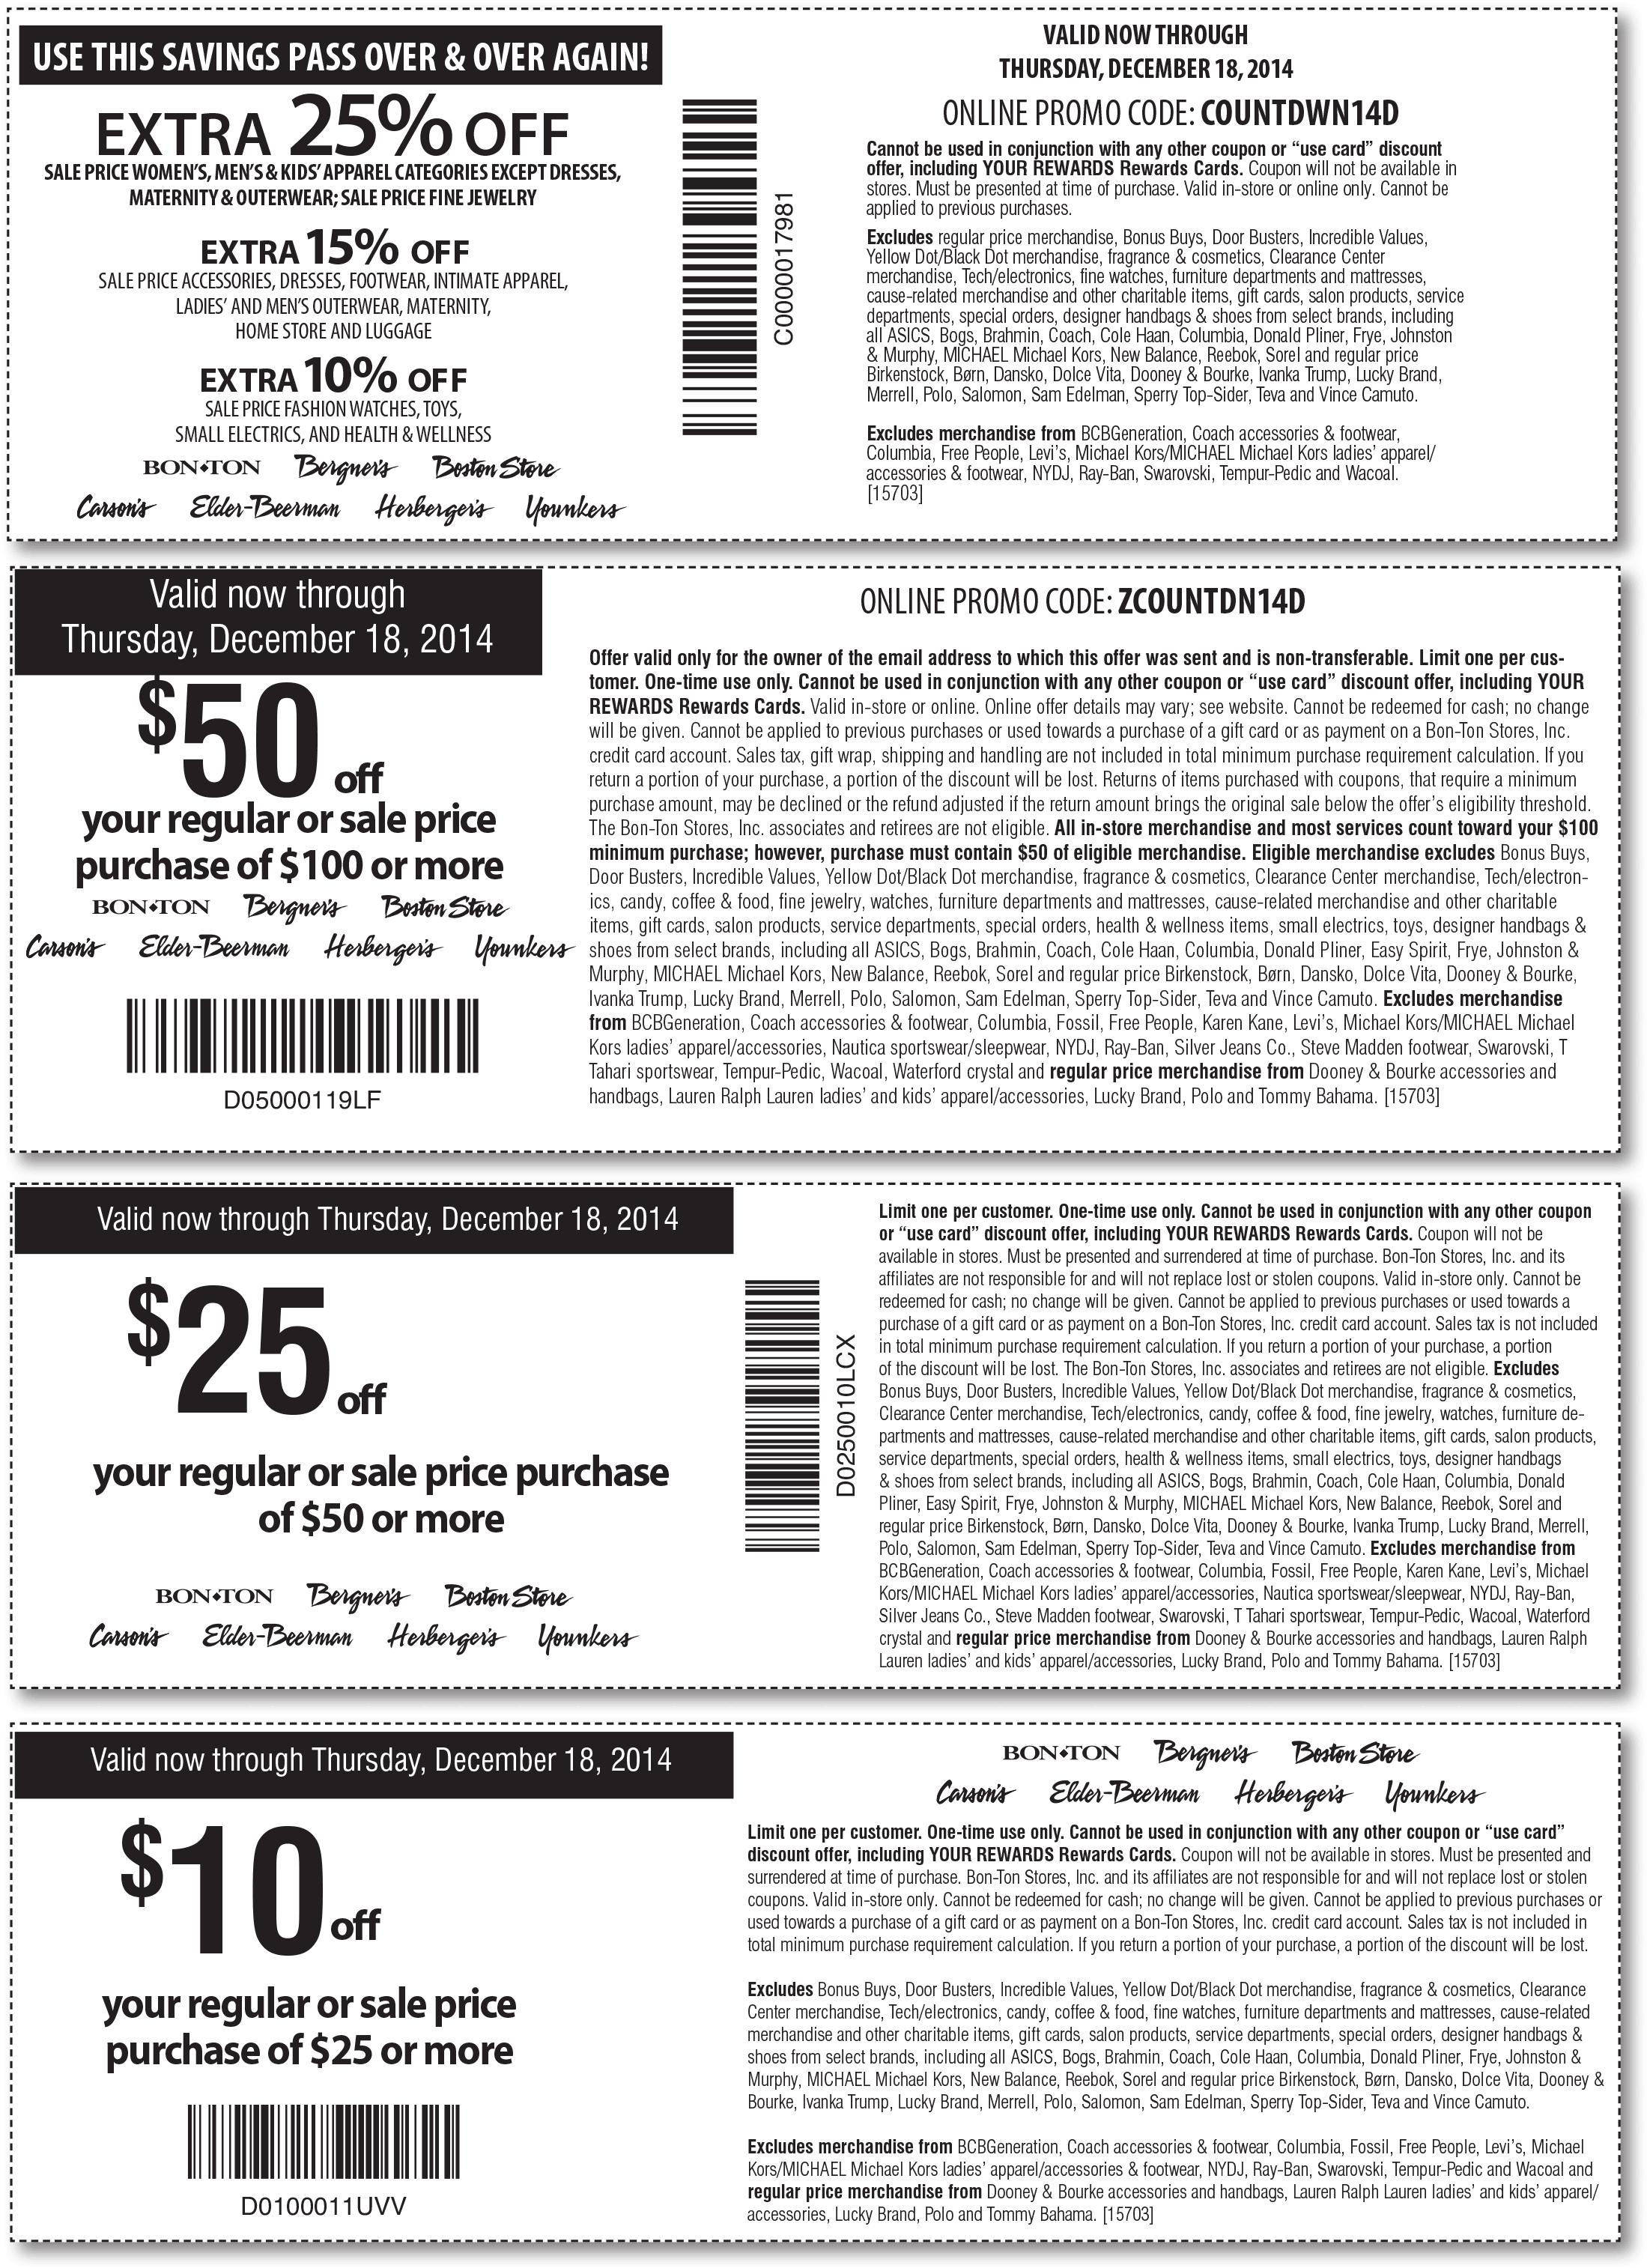 bon ton coupons 10 off 25 more at carsons bon ton. Black Bedroom Furniture Sets. Home Design Ideas